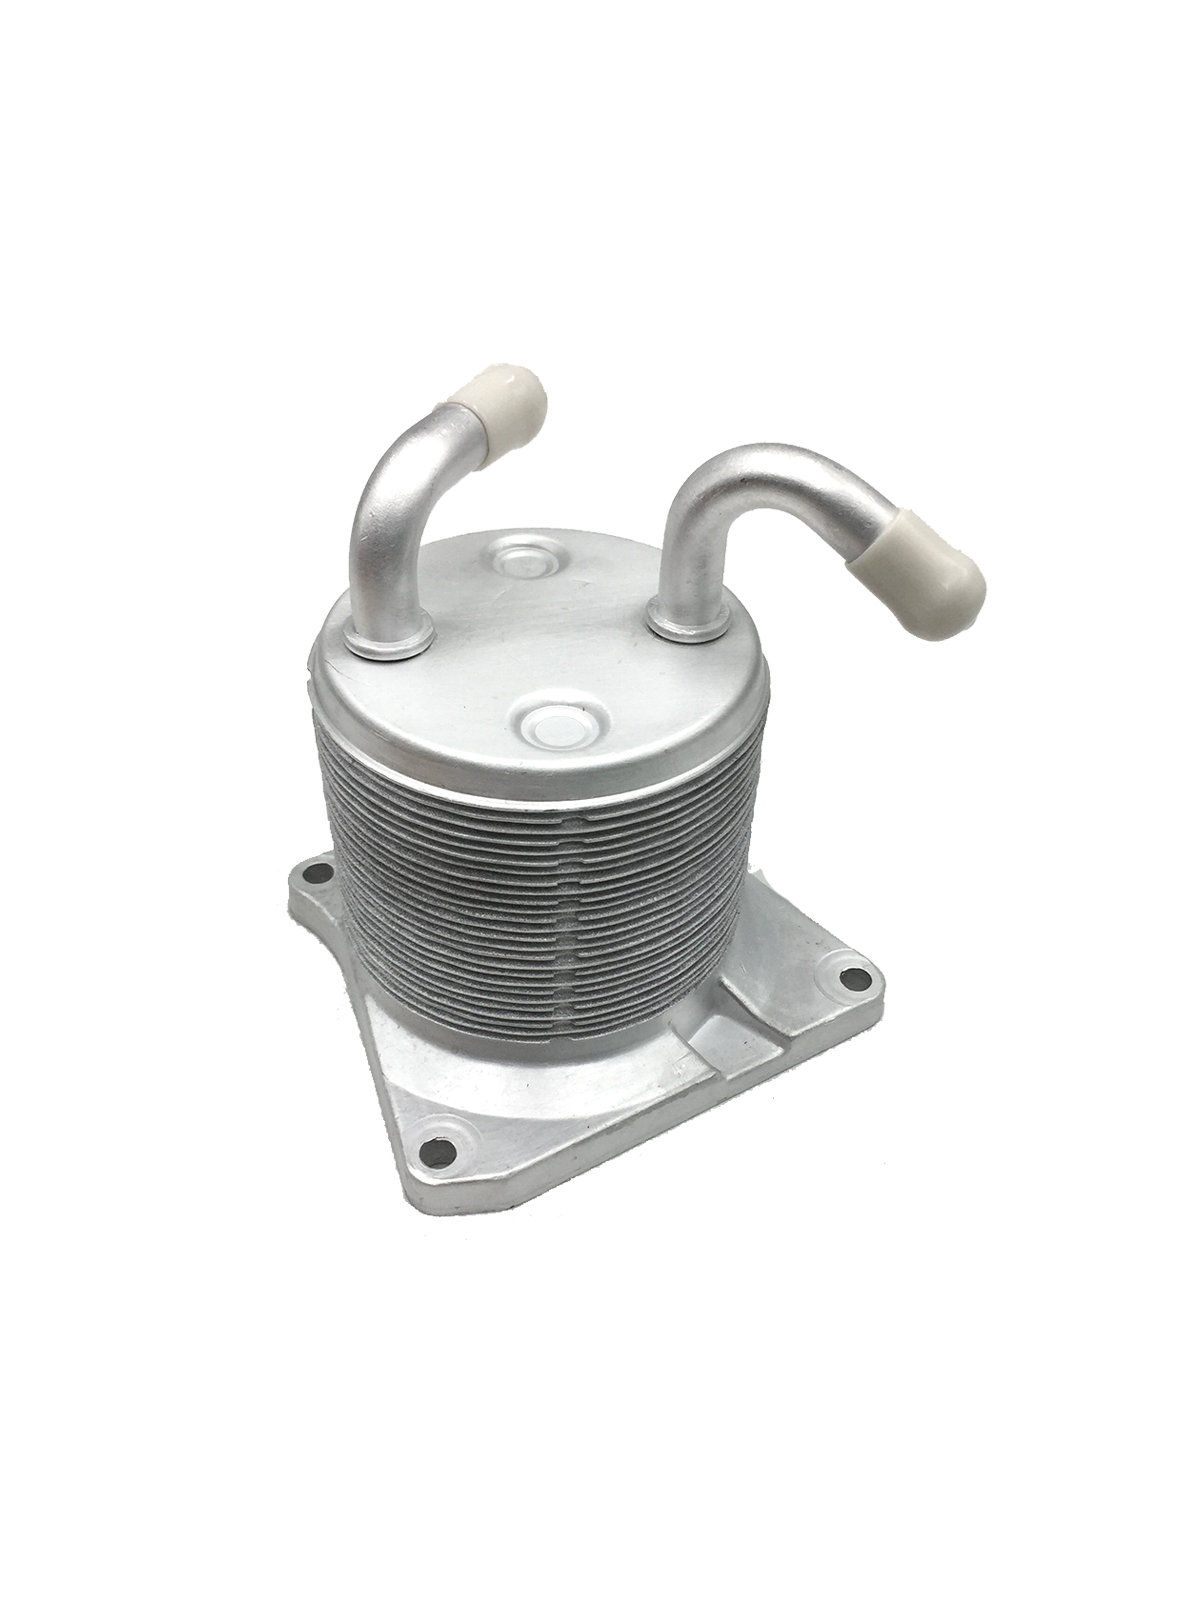 Trocador de Calor (Radiador) 7200756 - Nissan